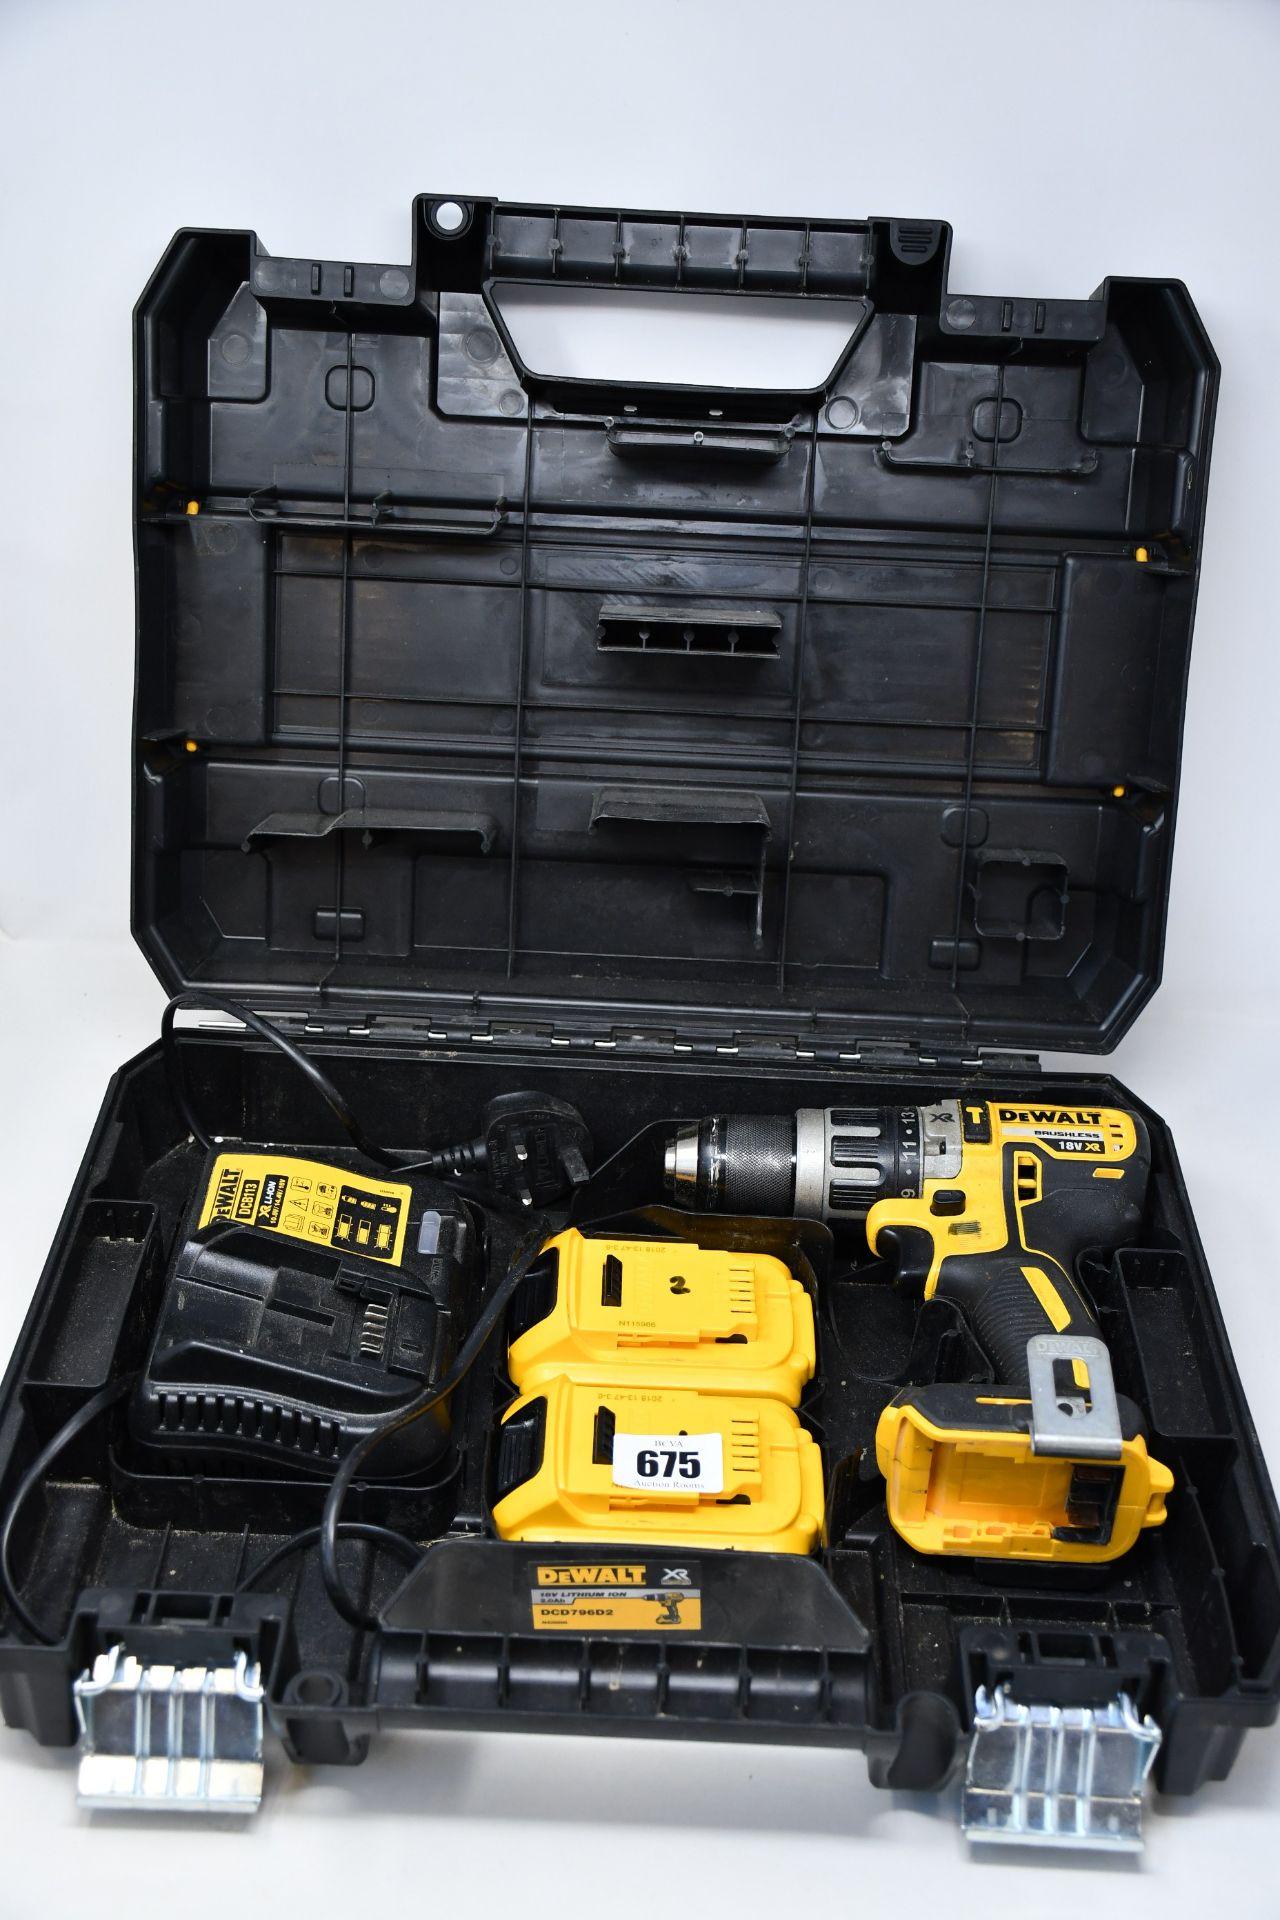 One boxed DeWalt brushless 18v cordless combi drill to include two DeWalt 18V 2.0AH LI-ION XR